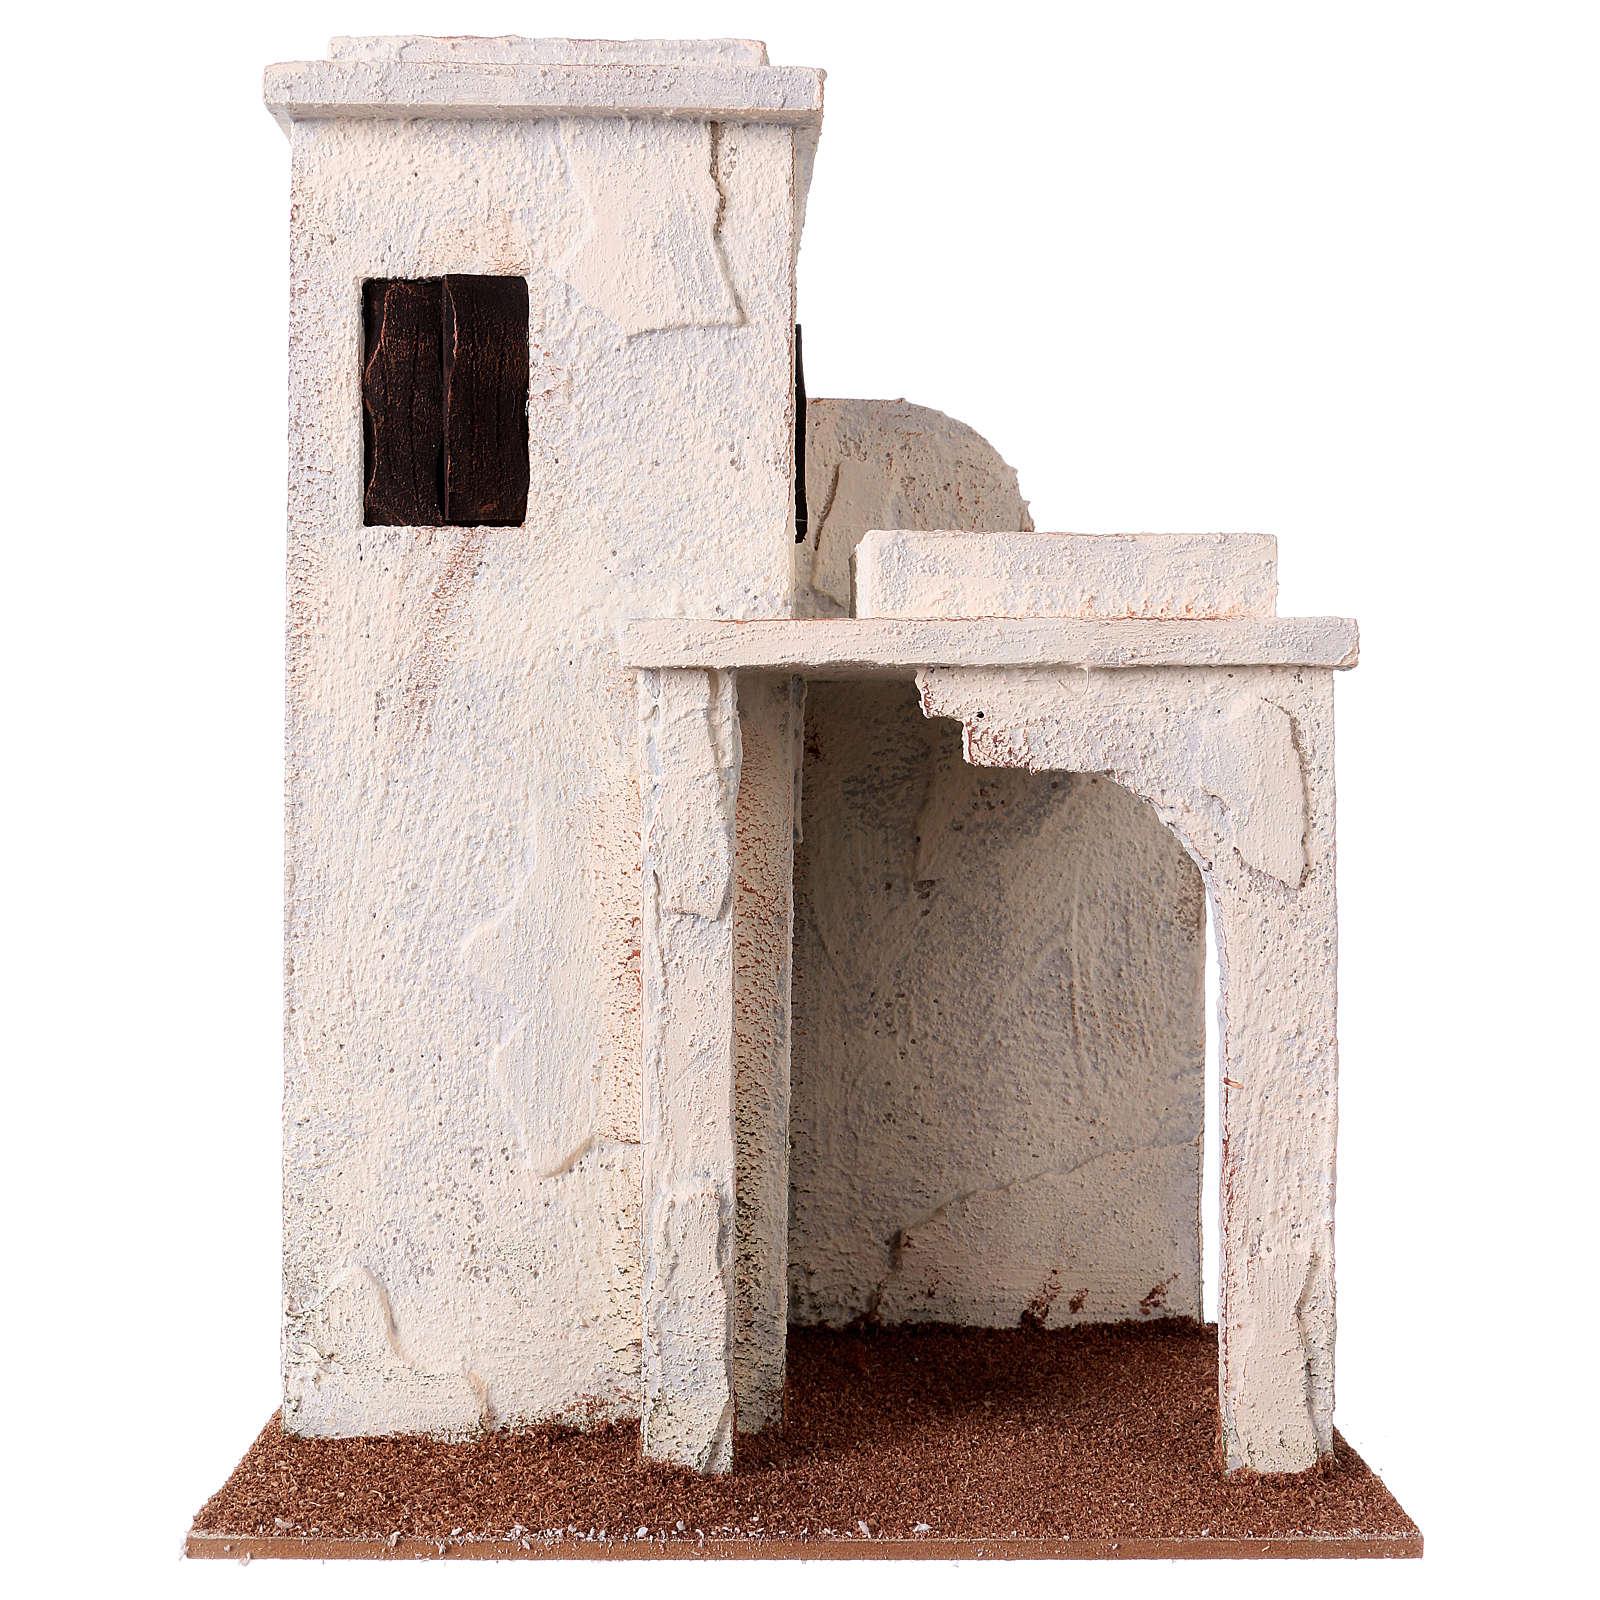 Casetta palestinese con finestre 30x25x15 cm per presepi di 11 cm 4